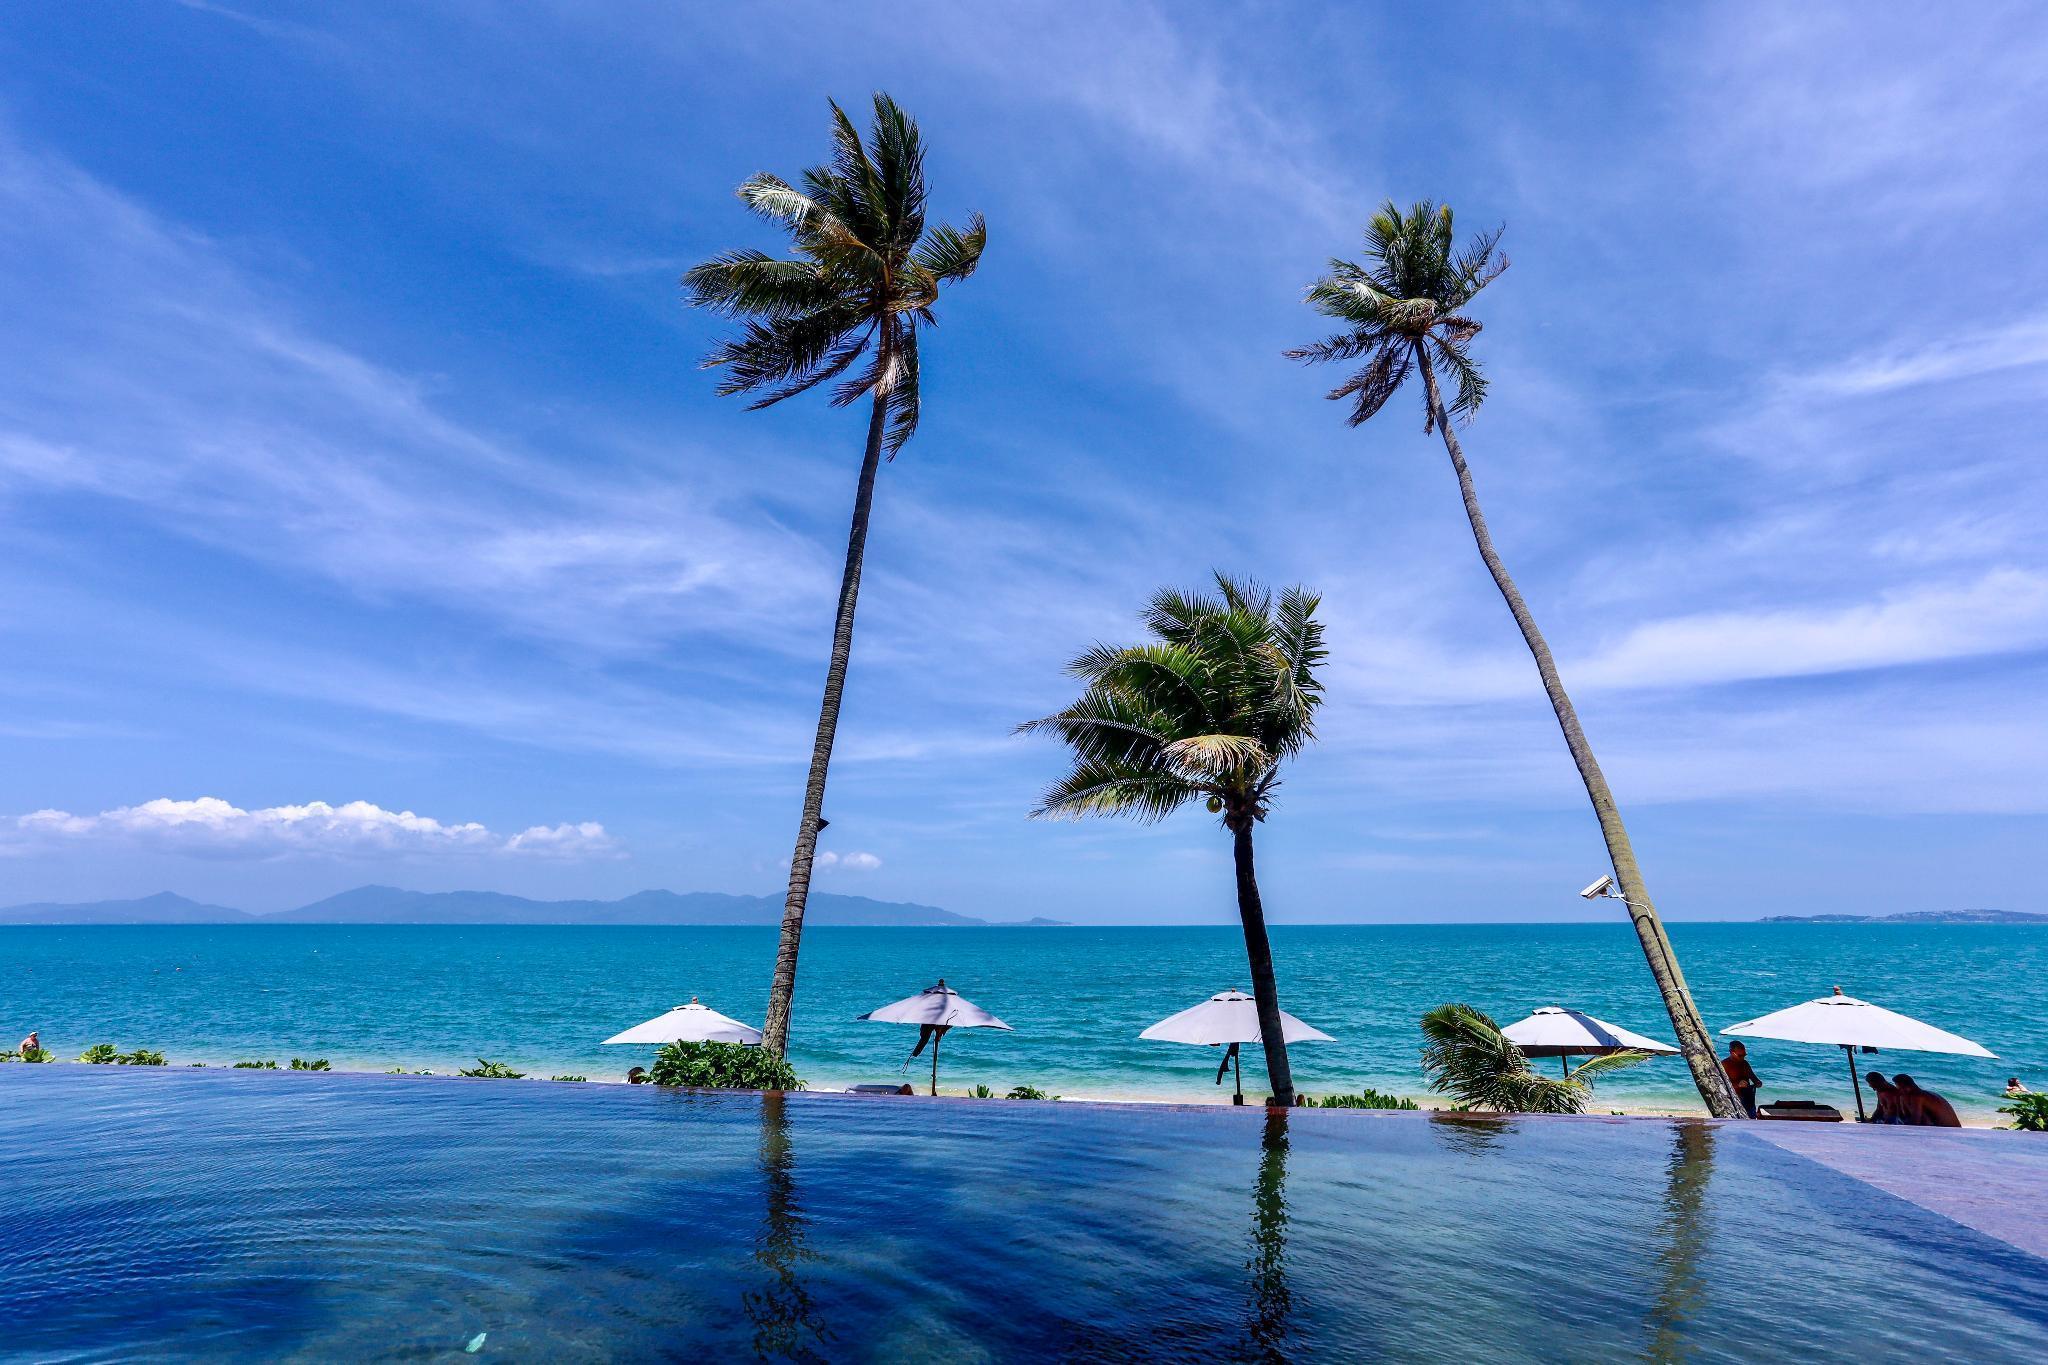 Saree Samui Natures Finest Resort สารี สมุย เนเจอร์ ฟายเนสต์ รีสอร์ต